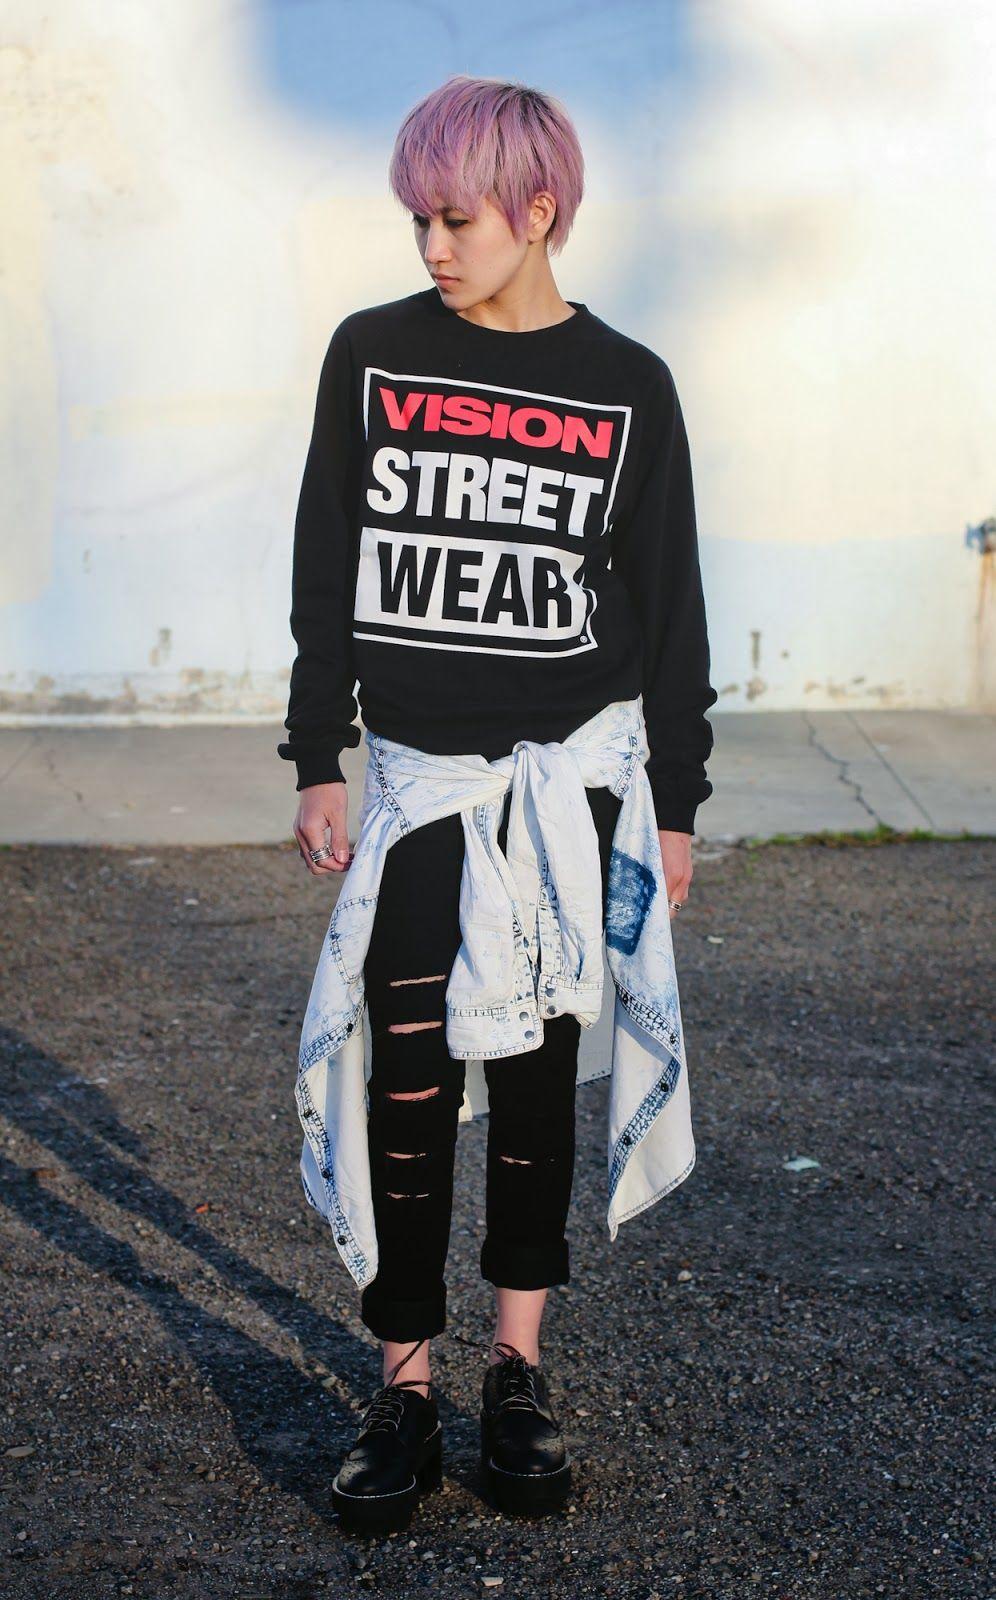 Vision Street WearVision Street Wear